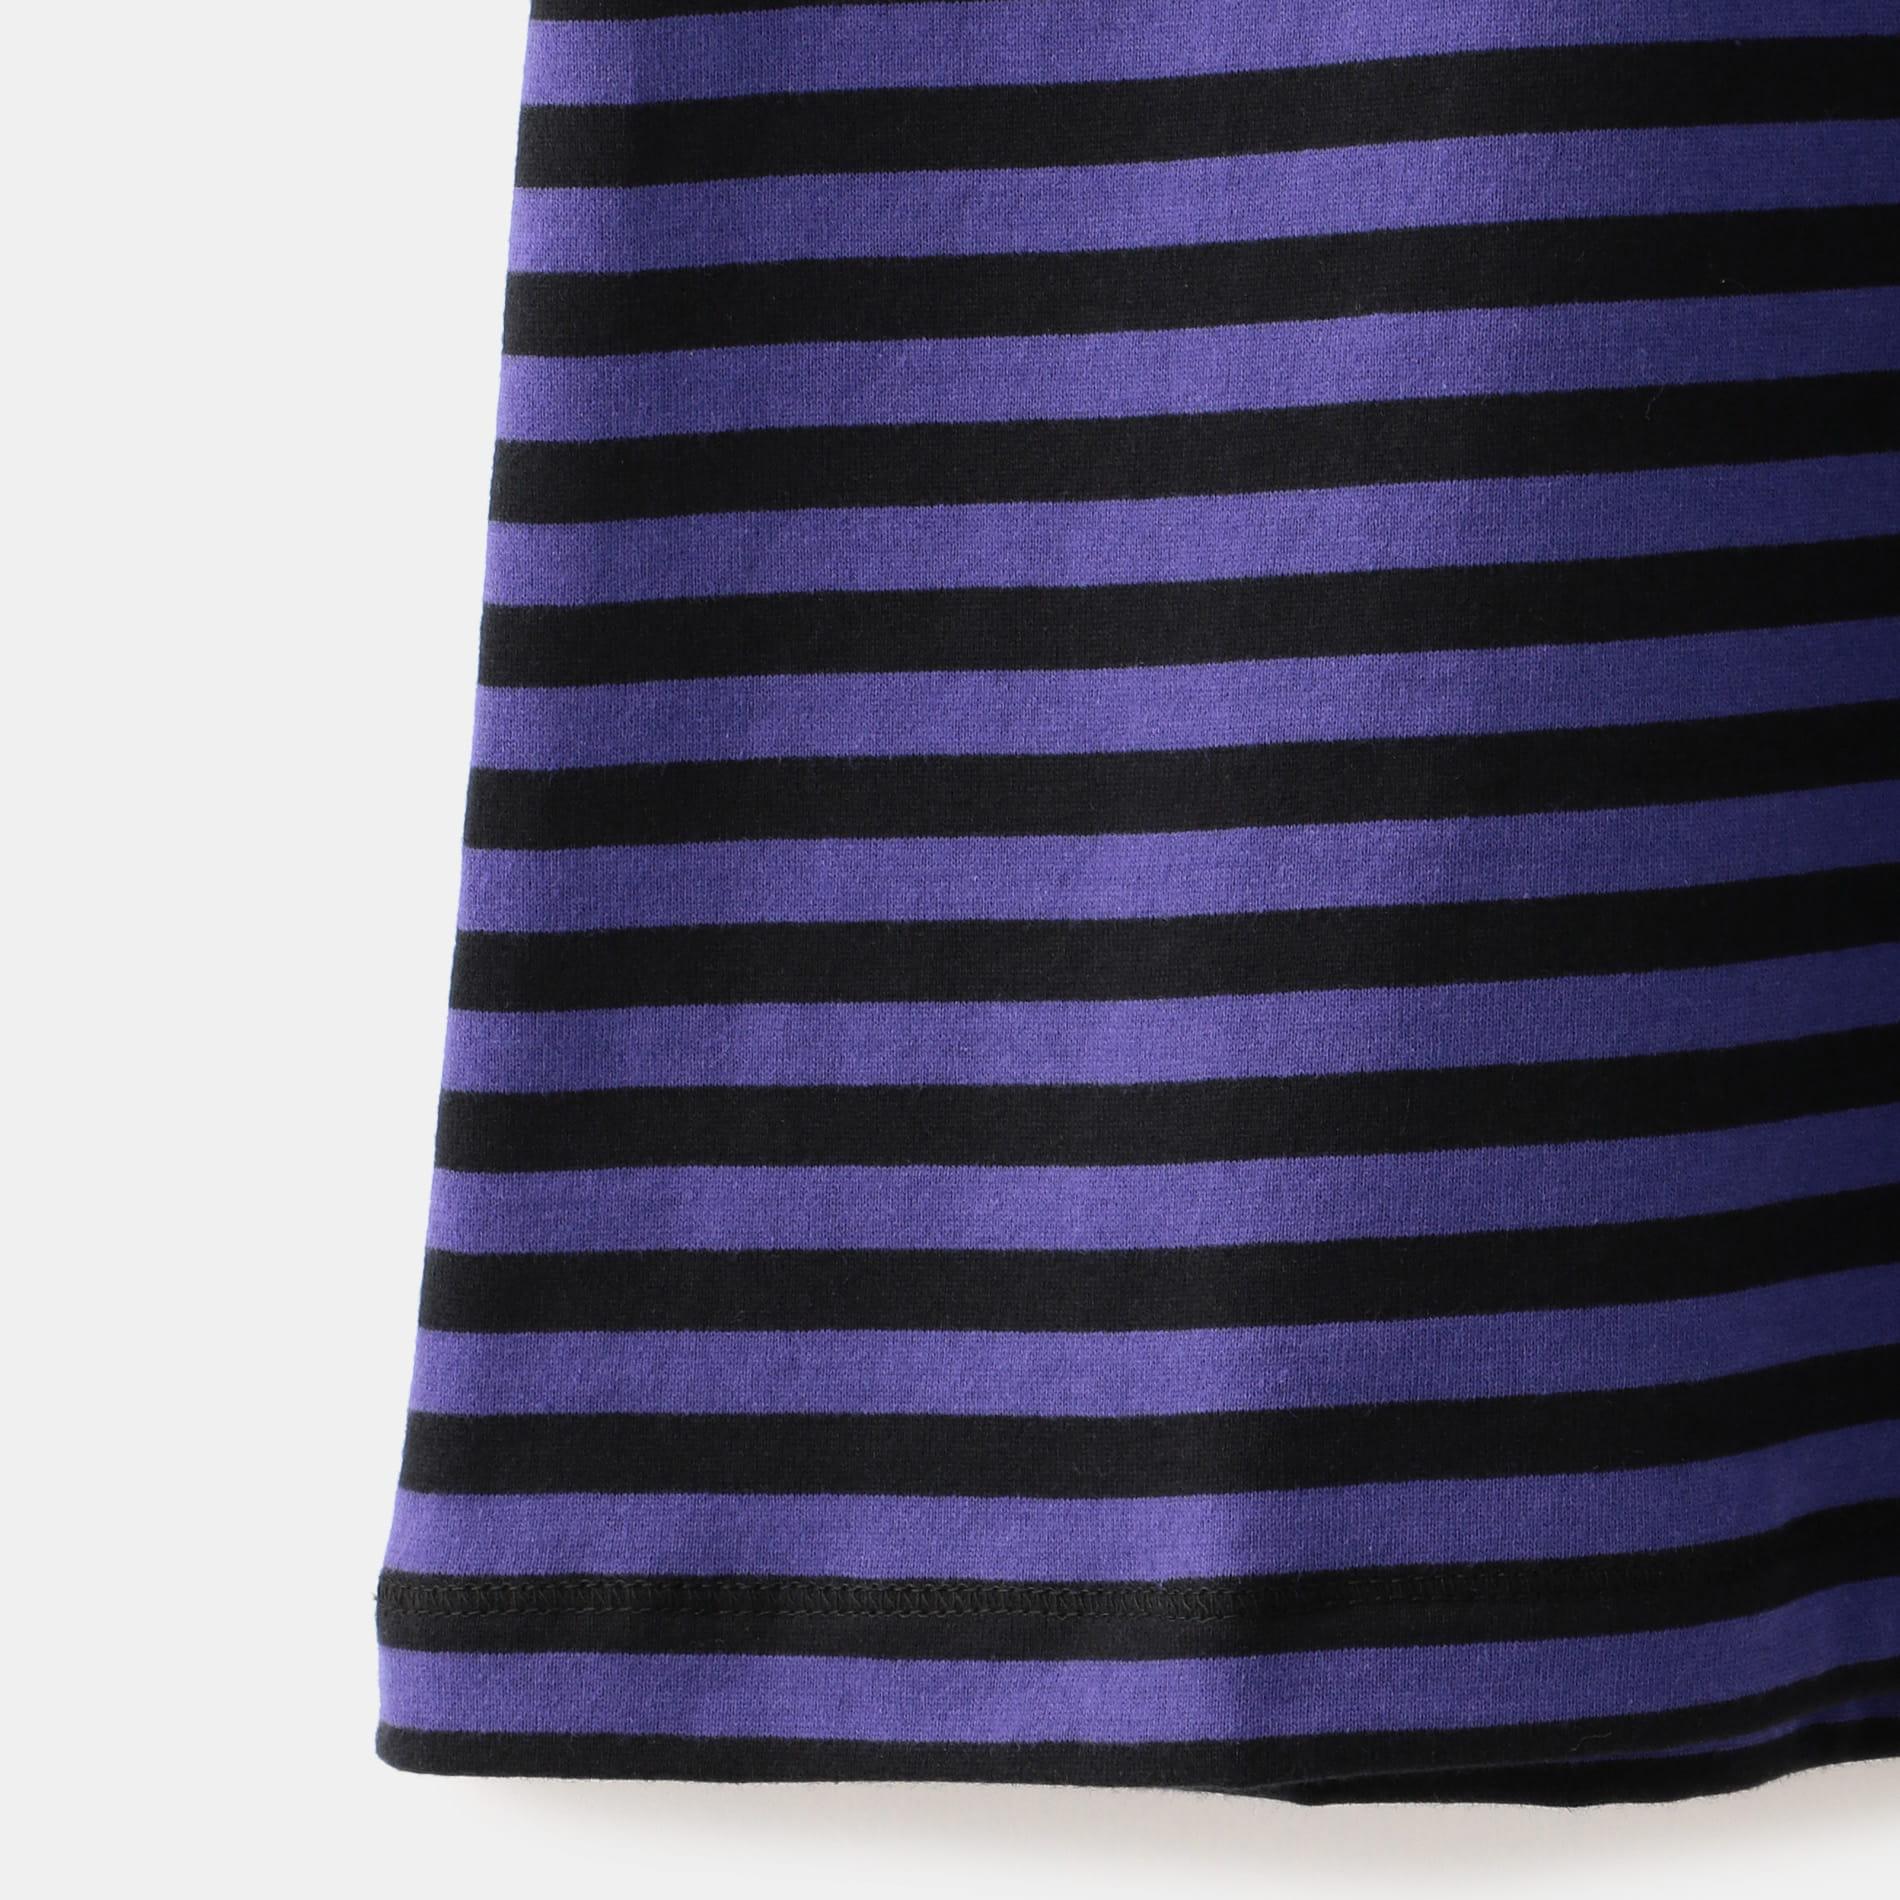 【Needles】WOMEN S/S Papillon Emb.Tee-Cottpn Jersey/Stripe GL252